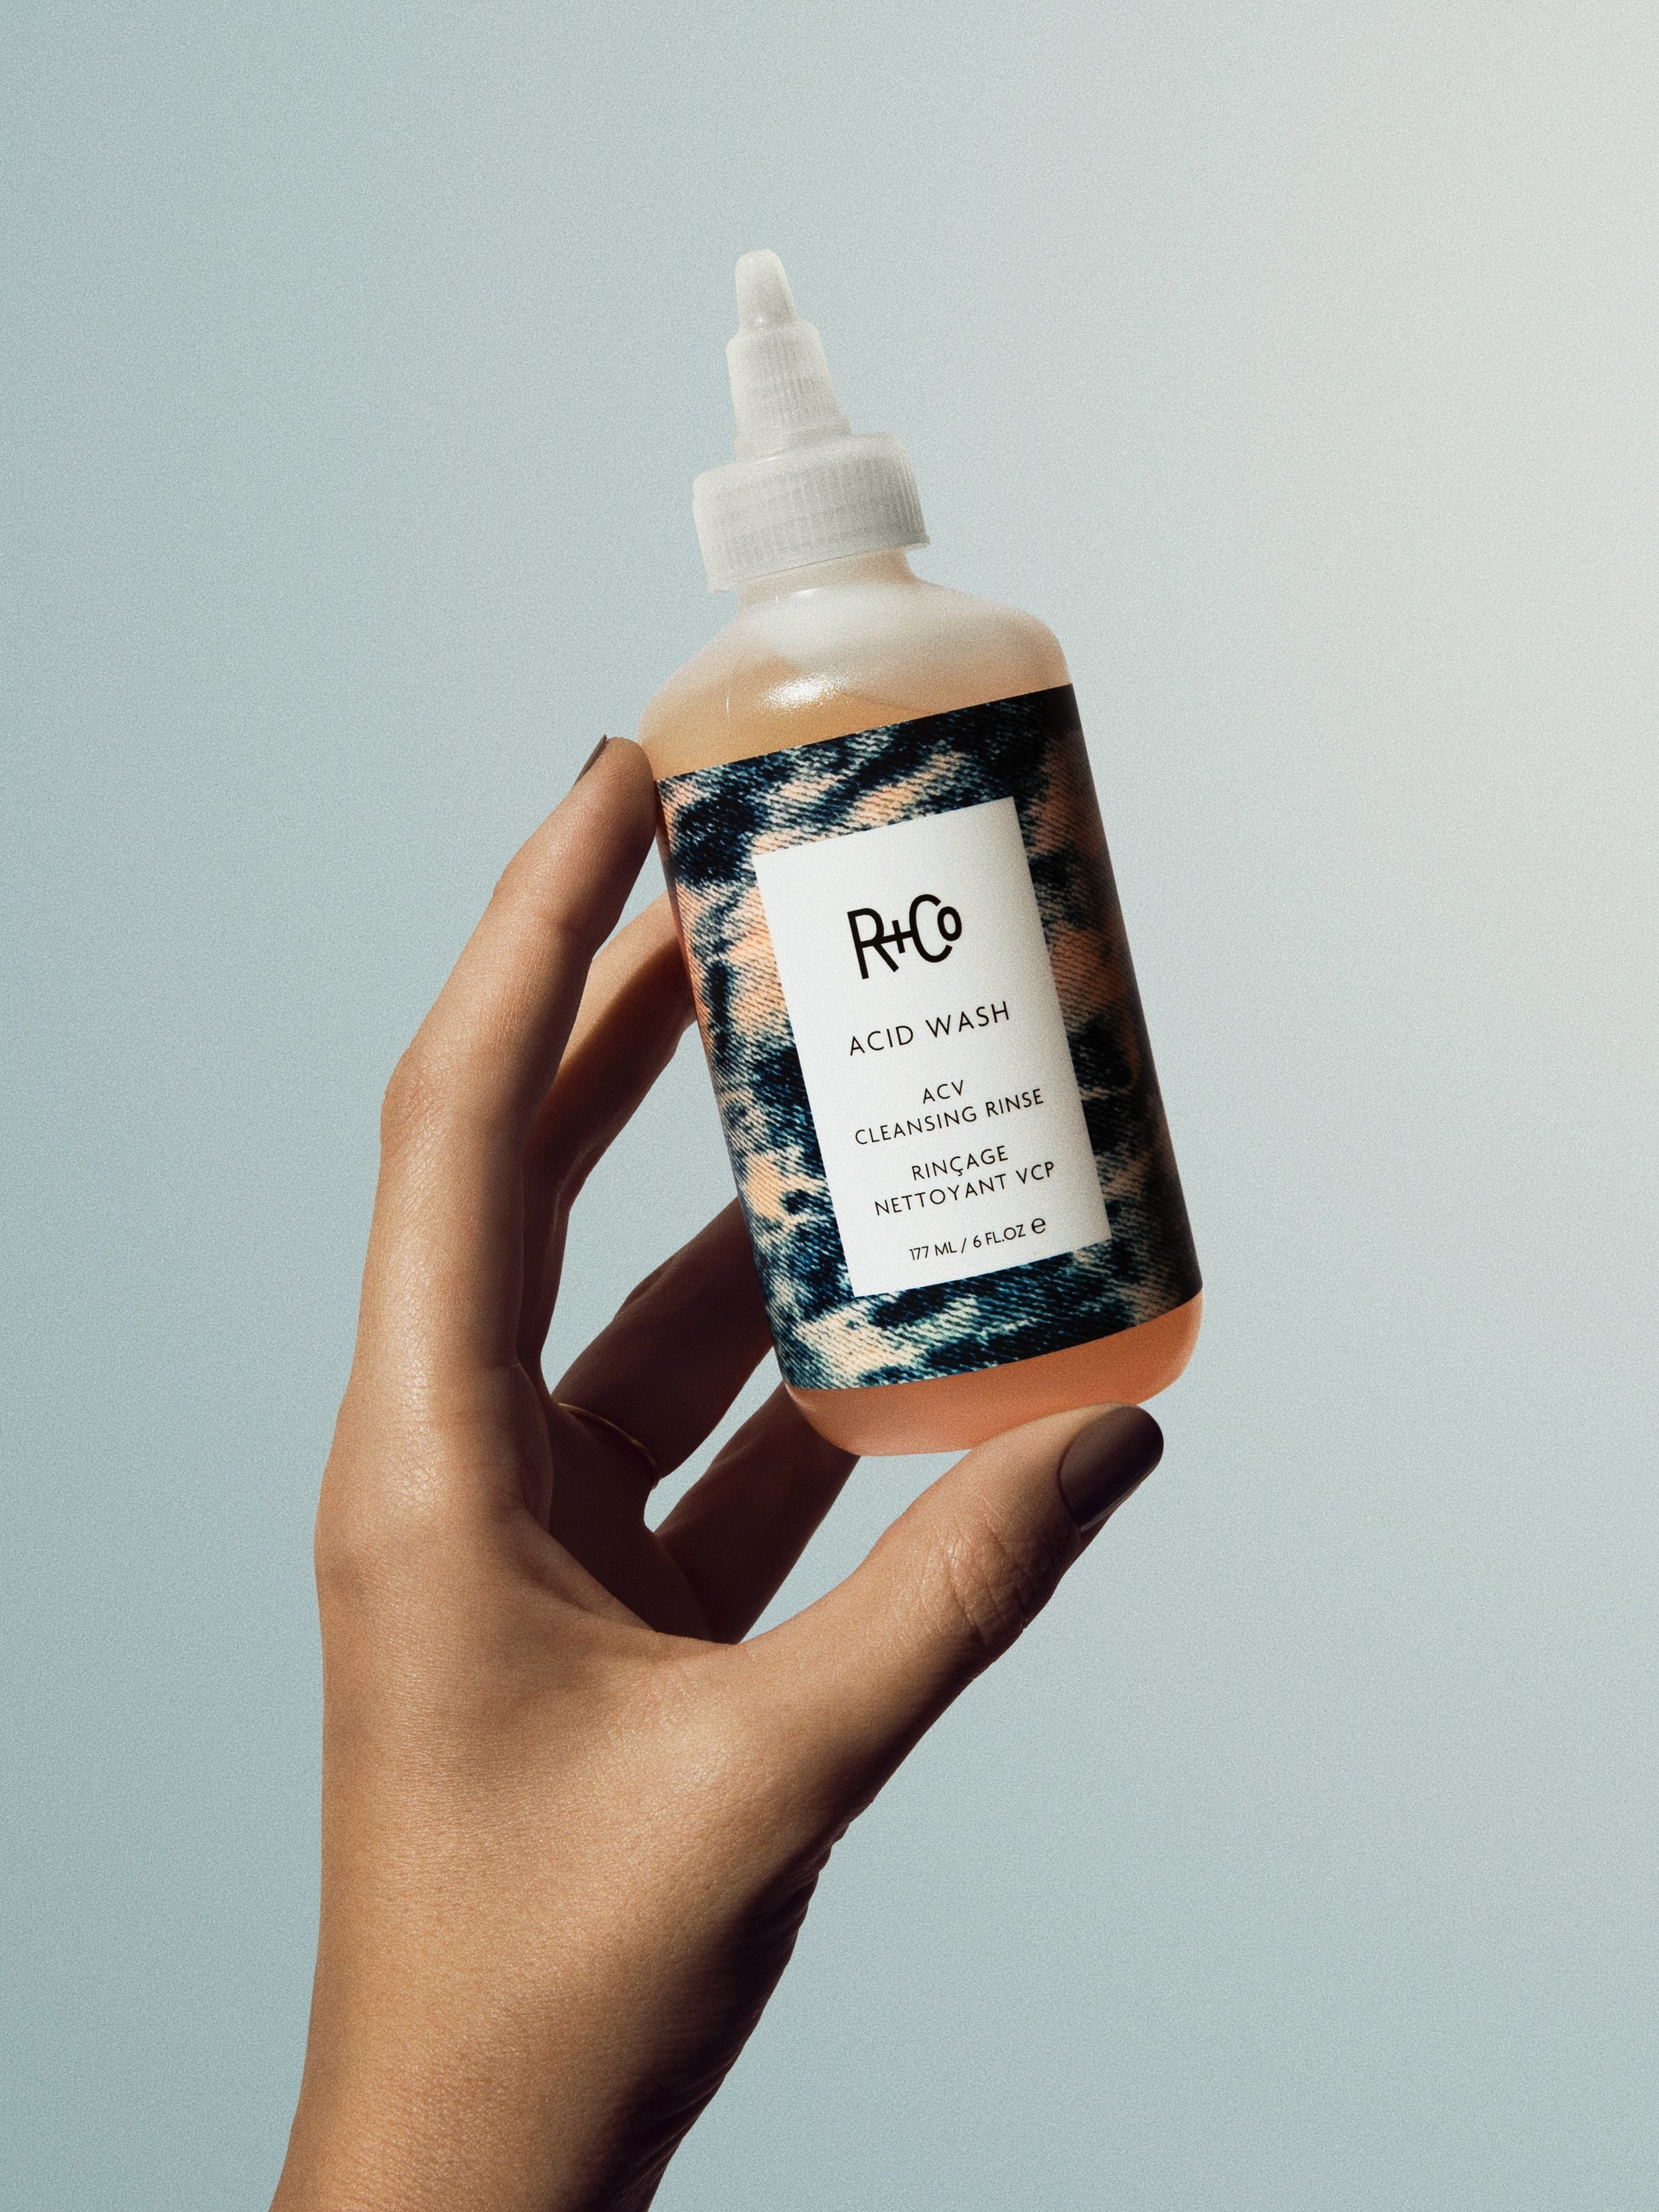 R&Co.JPG